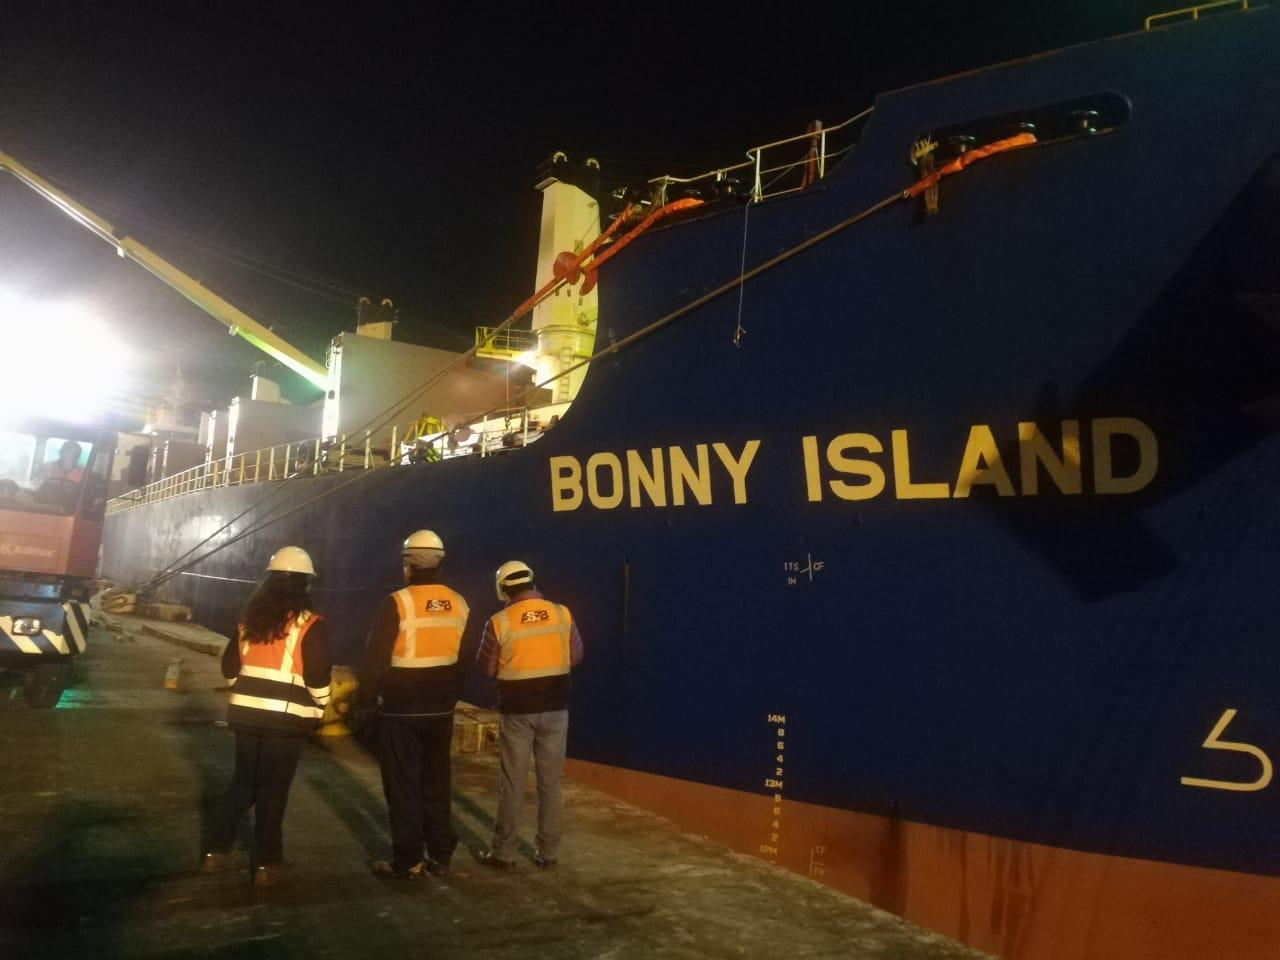 ASP-B: Ilo recibe 10 Mil Tn de carga boliviana